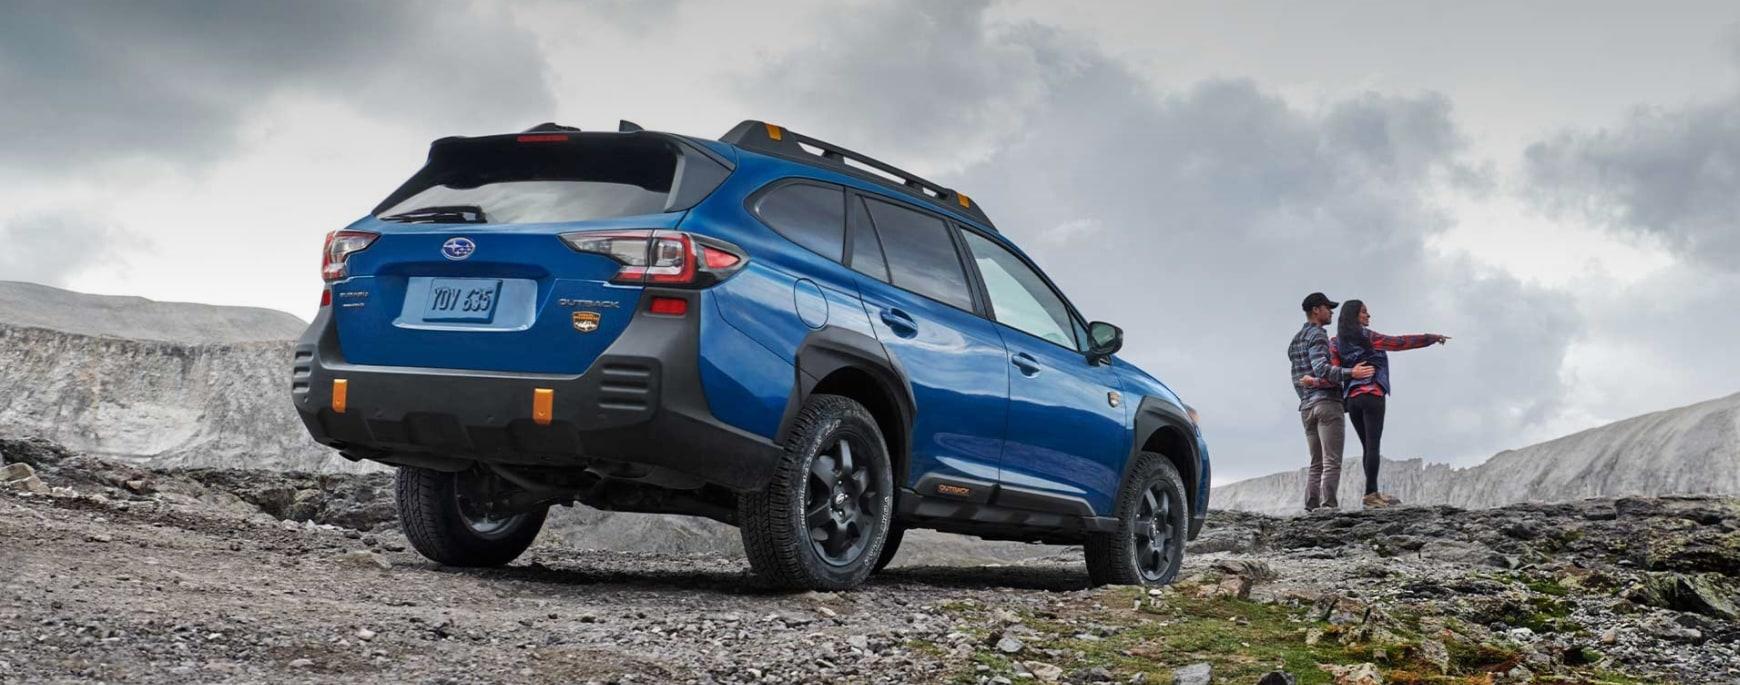 Subaru Outback Wilderness - Desjardins Subaru